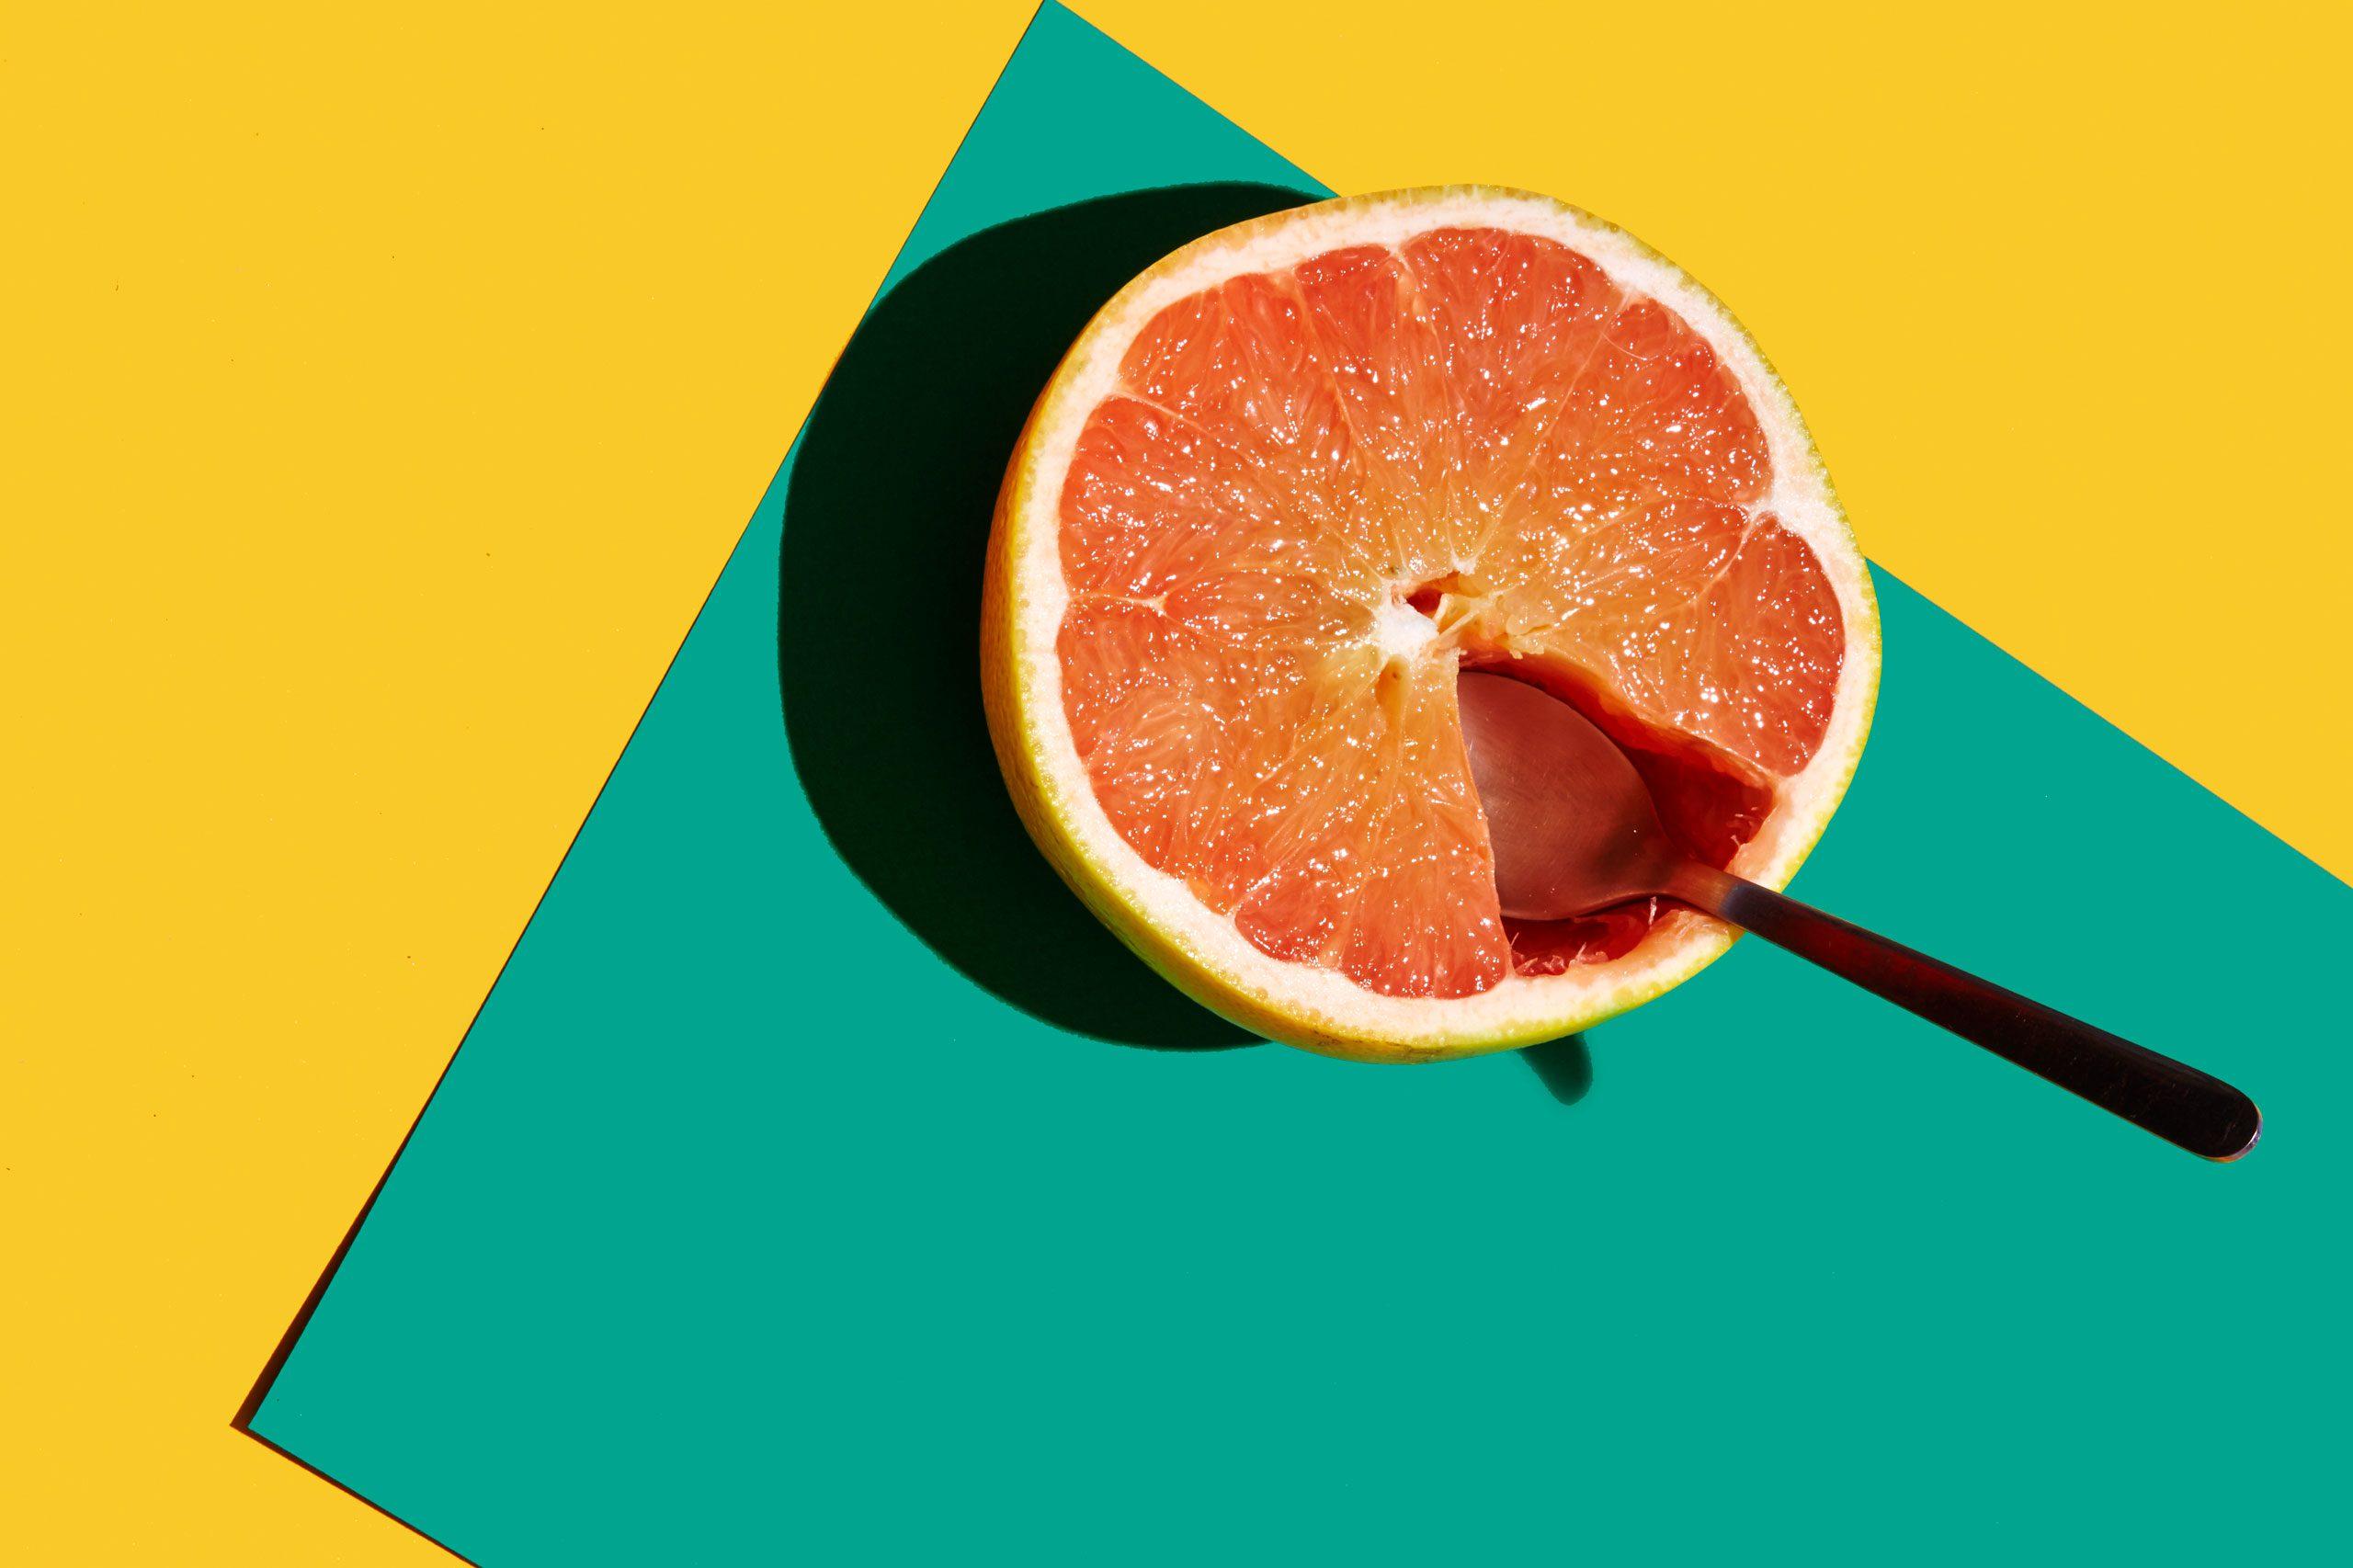 healthiest foods, health food, diet, nutrition, time.com stock, grapefruit, fruit, citrus